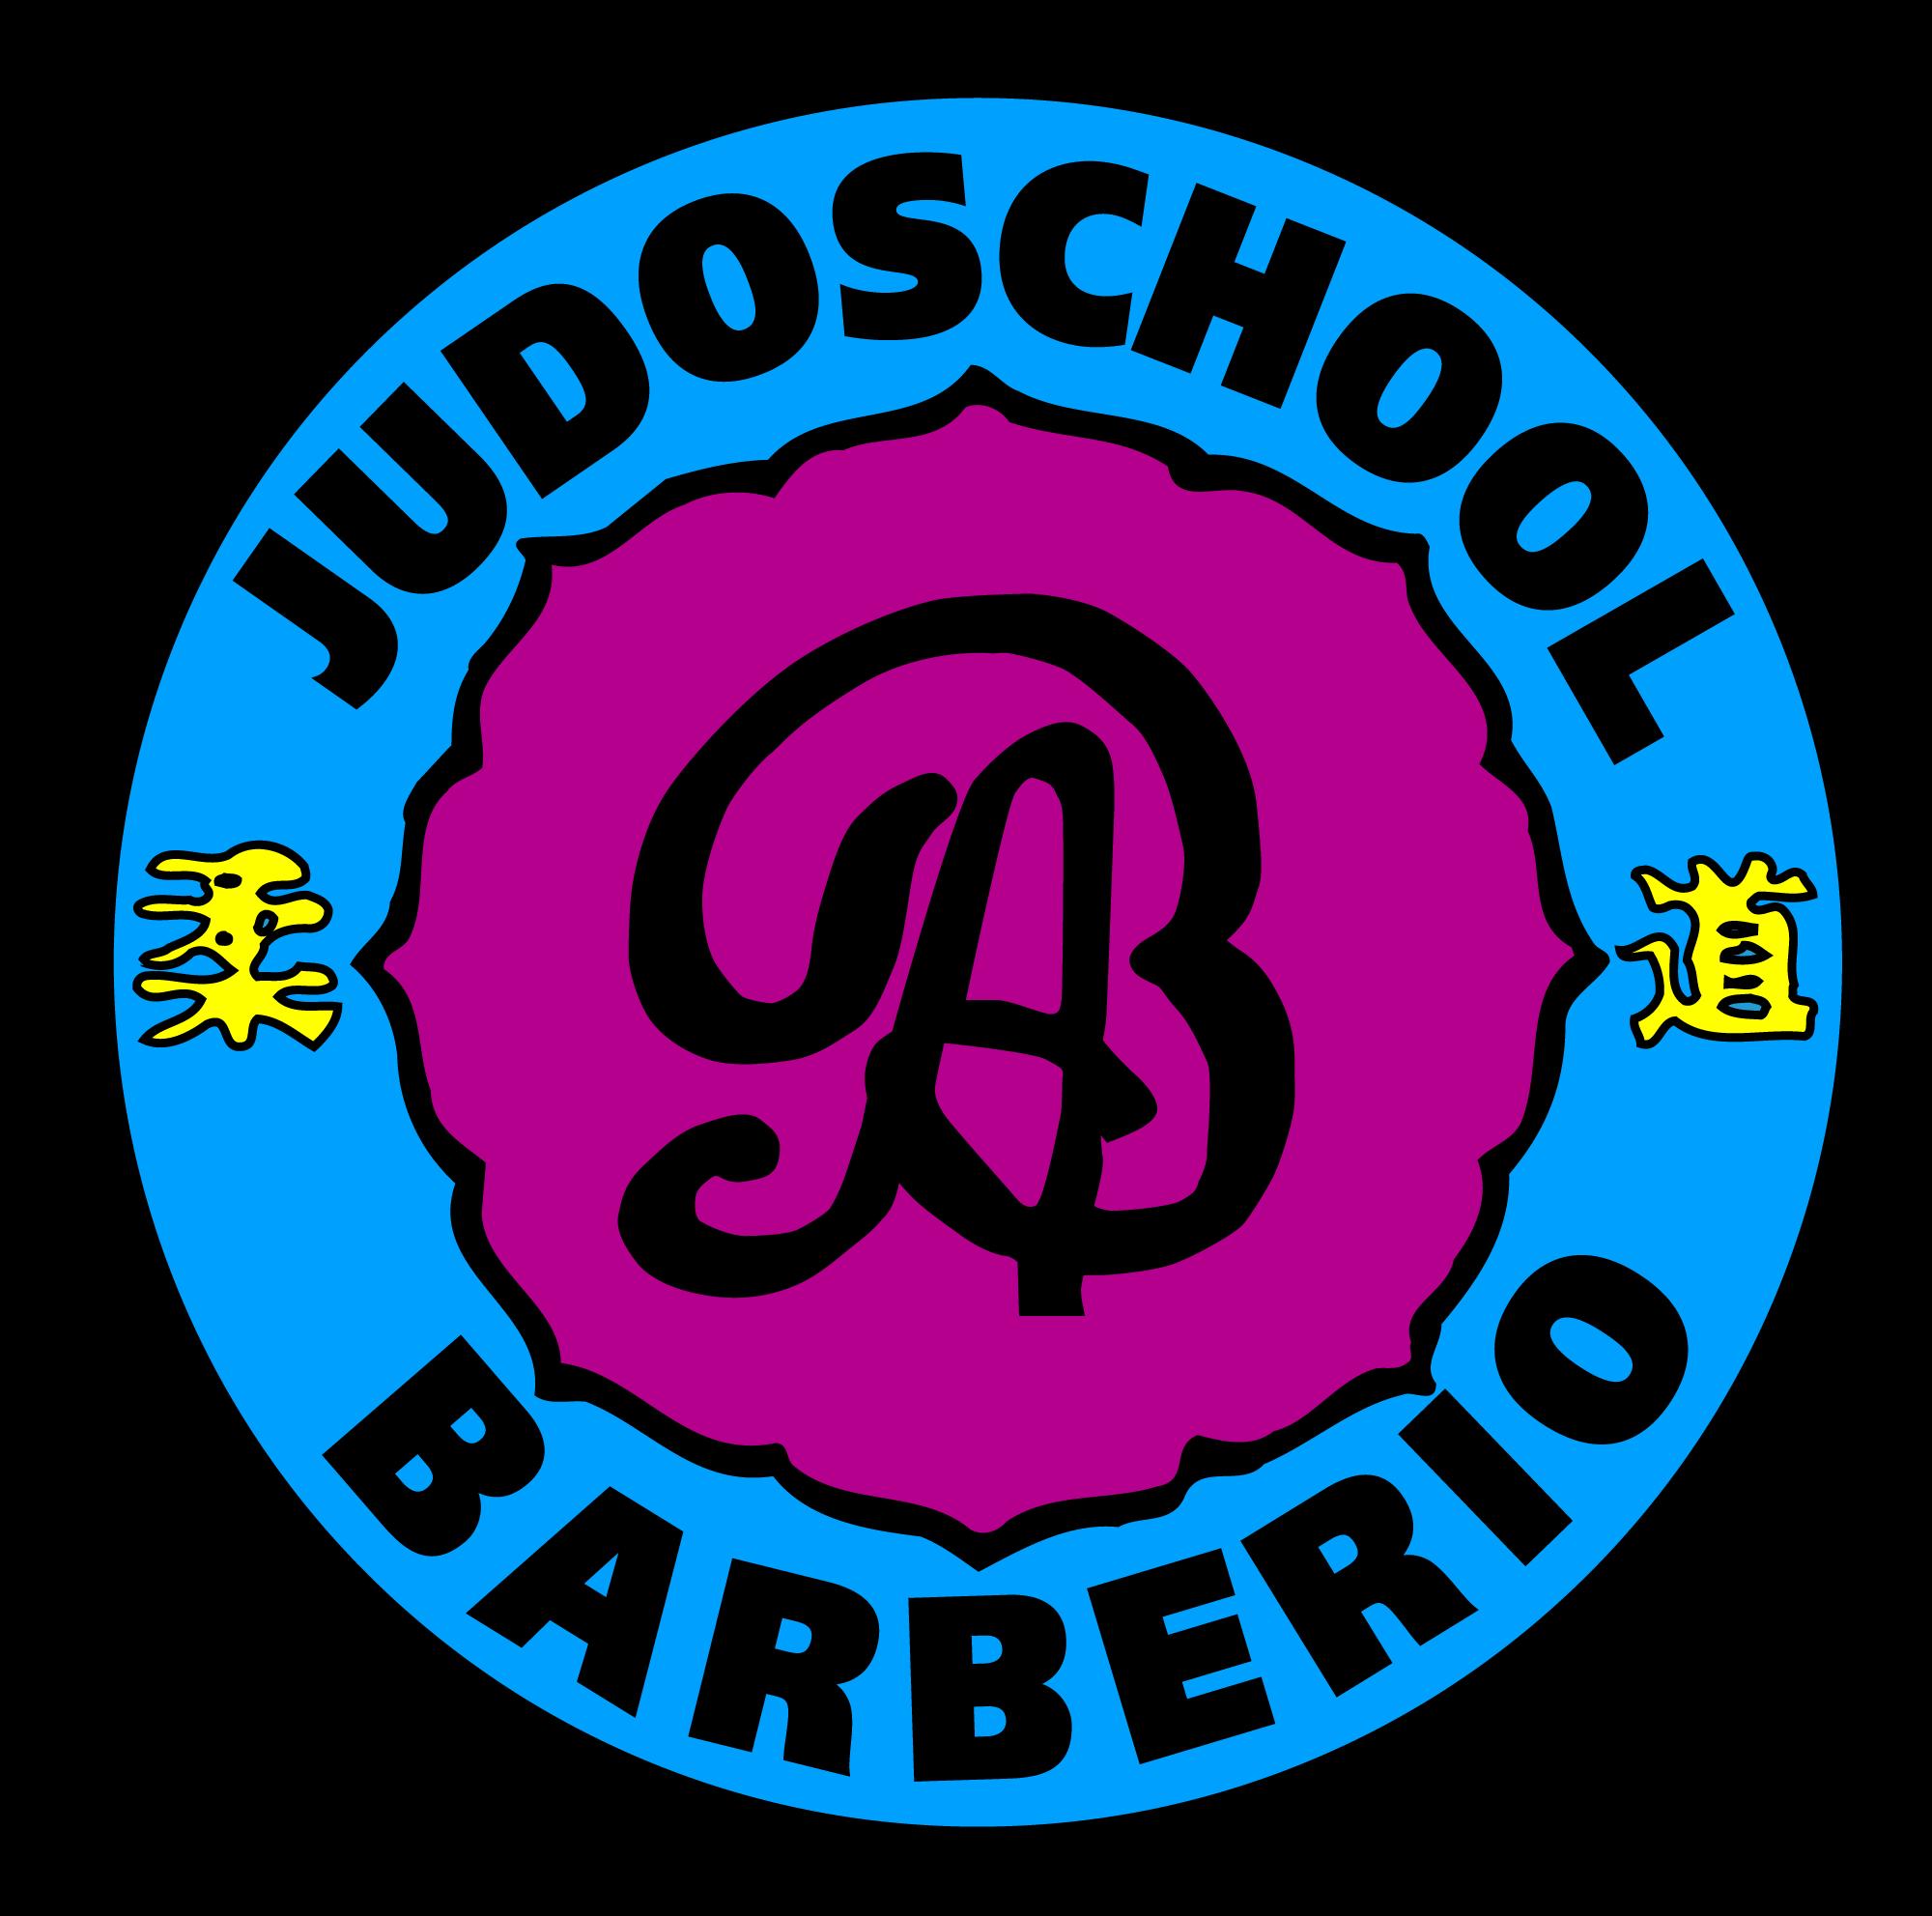 judoschool barberio logo